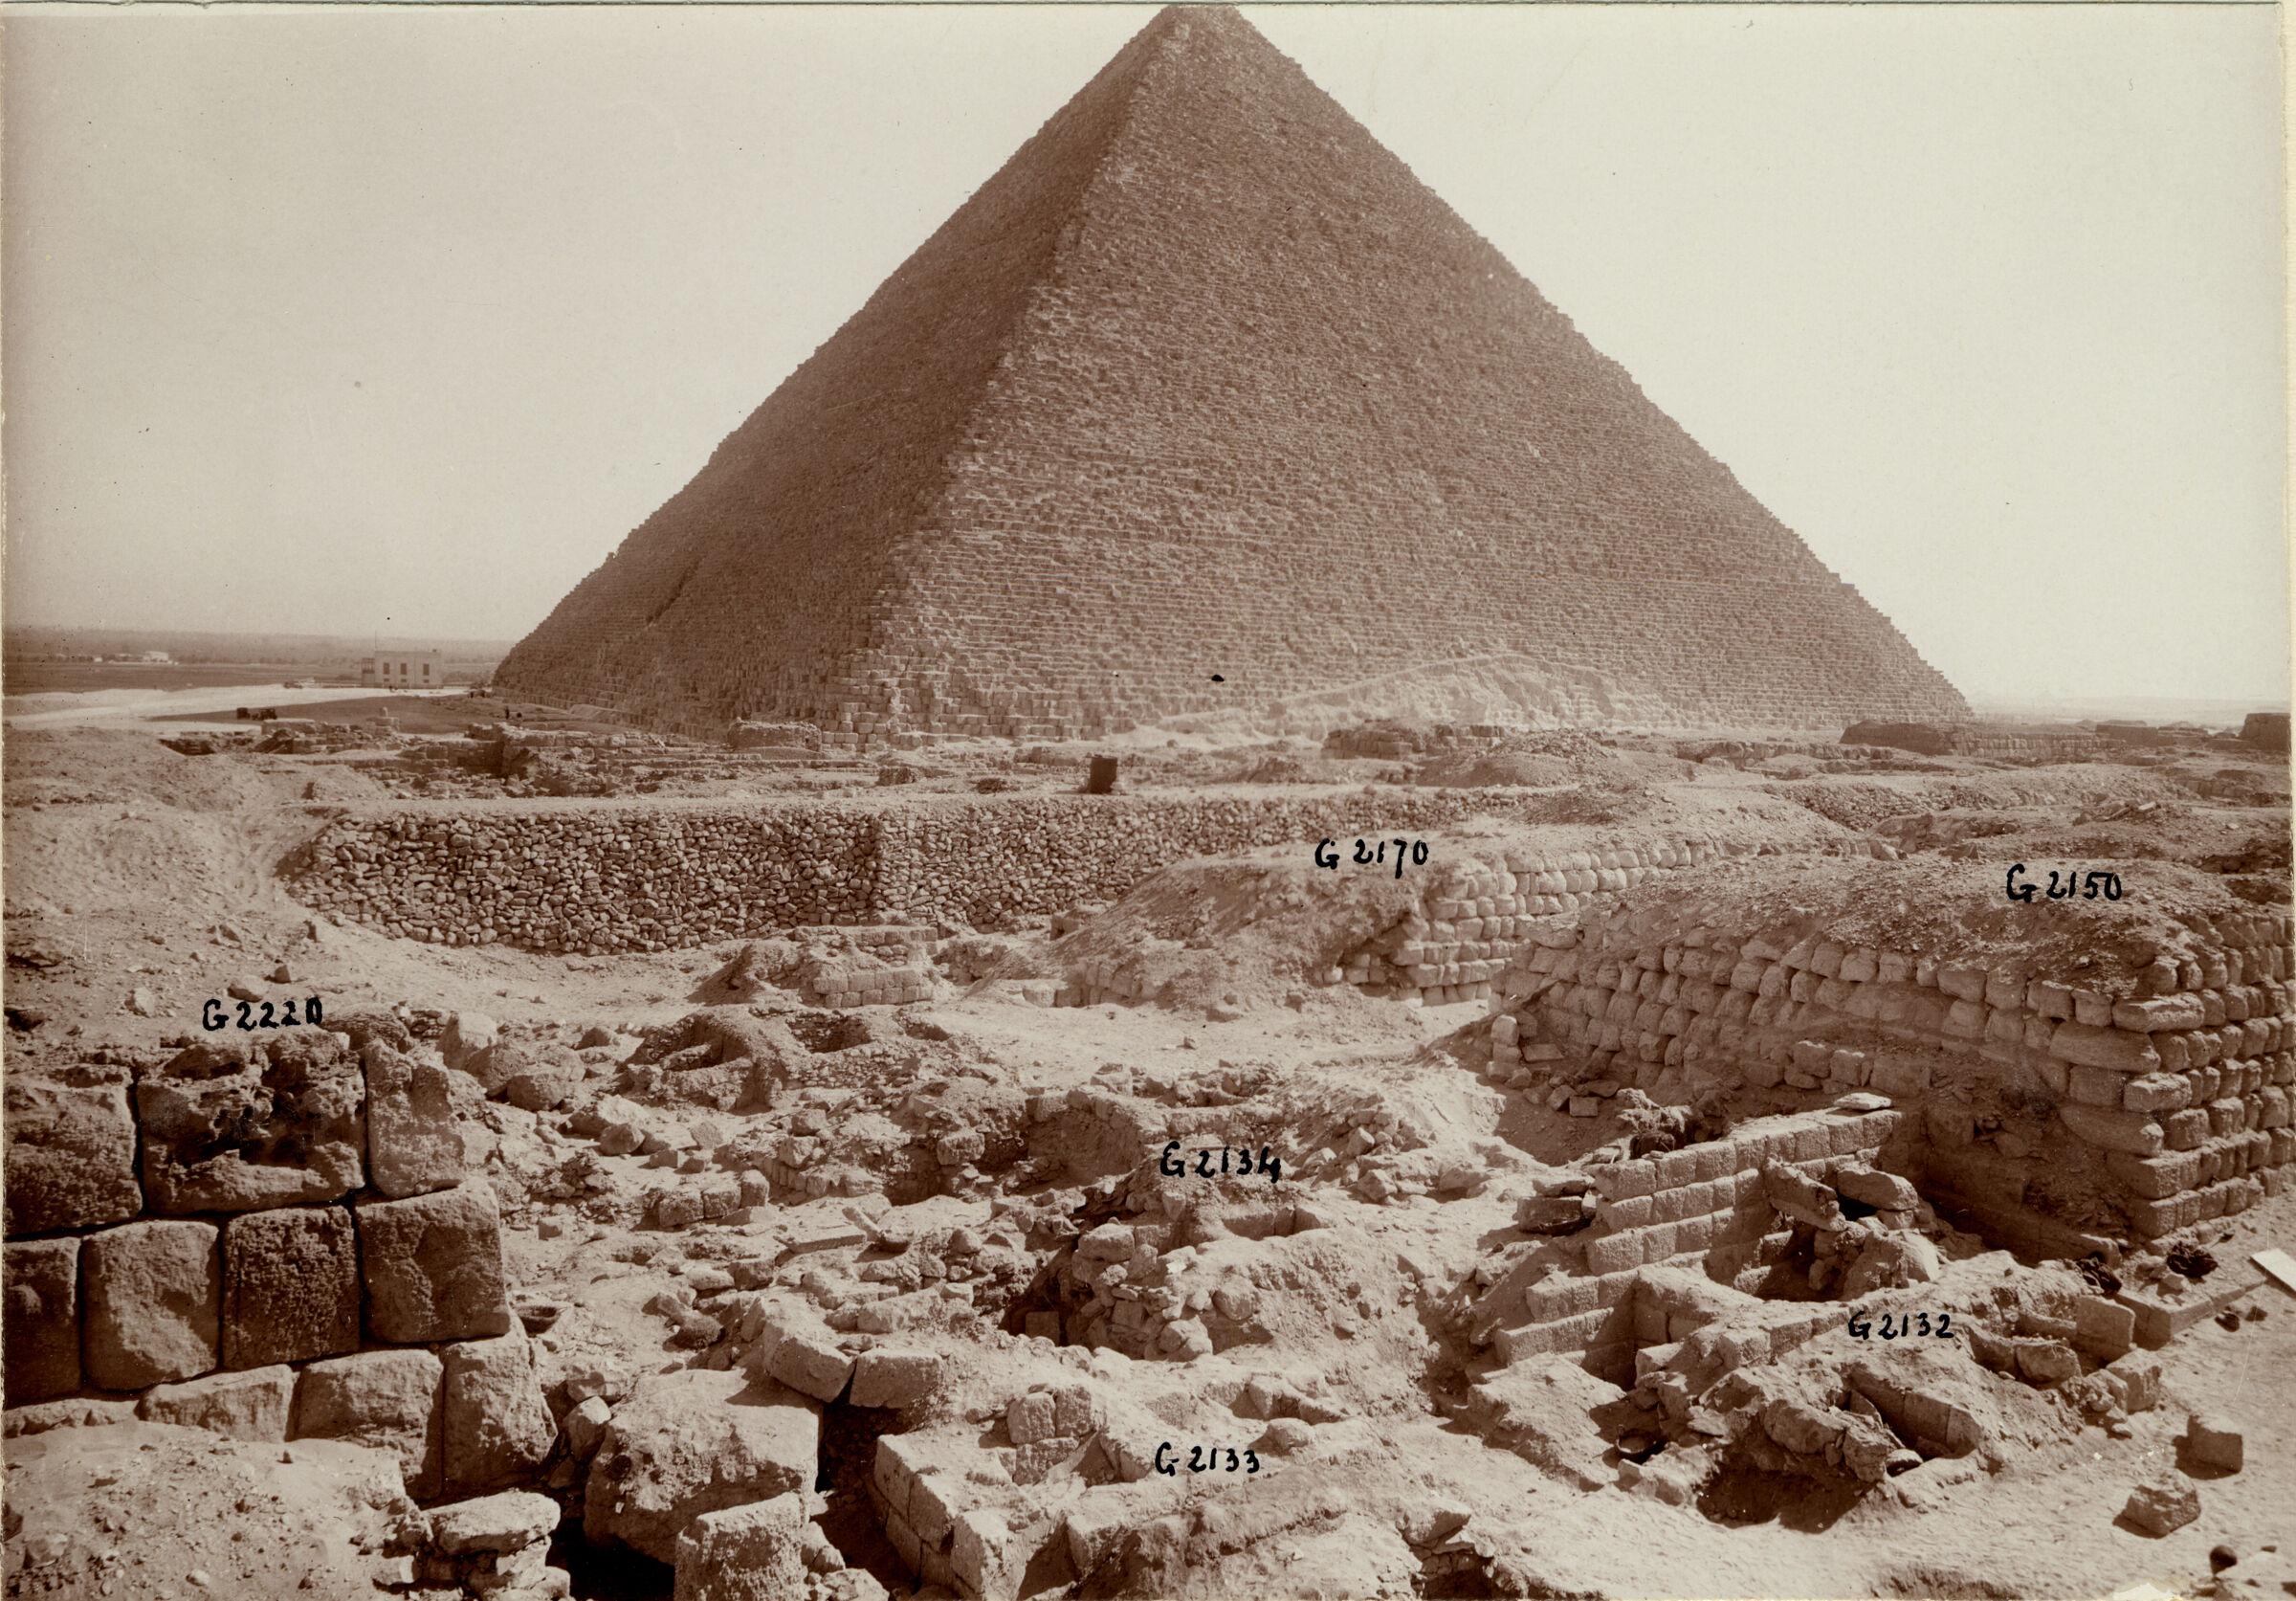 Western Cemetery: Site: Giza; View: G 2220, G 2150, G 2133, G 2130, G 2131, G 2132, G 2134, G 2134a, G 2170